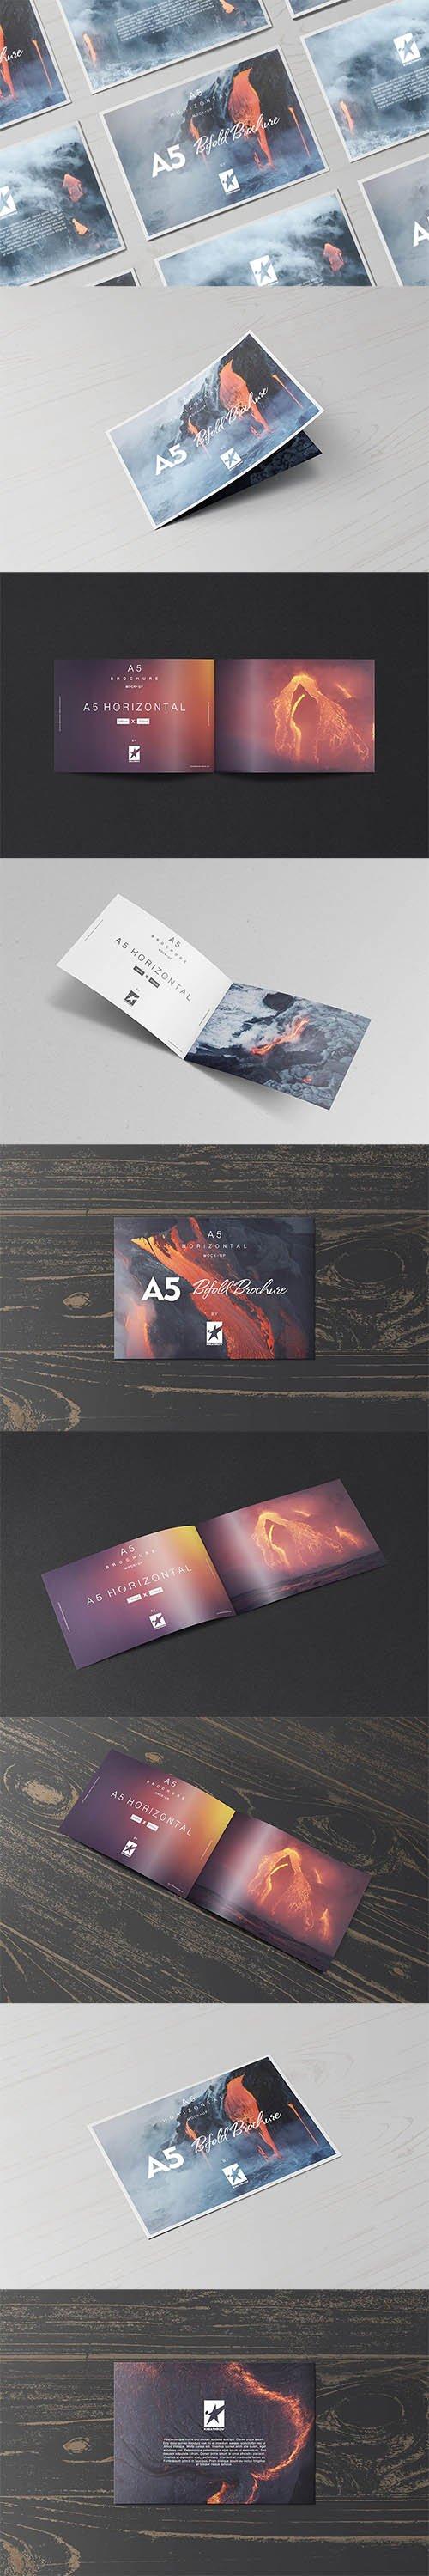 Bi-Fold A5 Horizontal Brochure Mock-Ups Vol.1